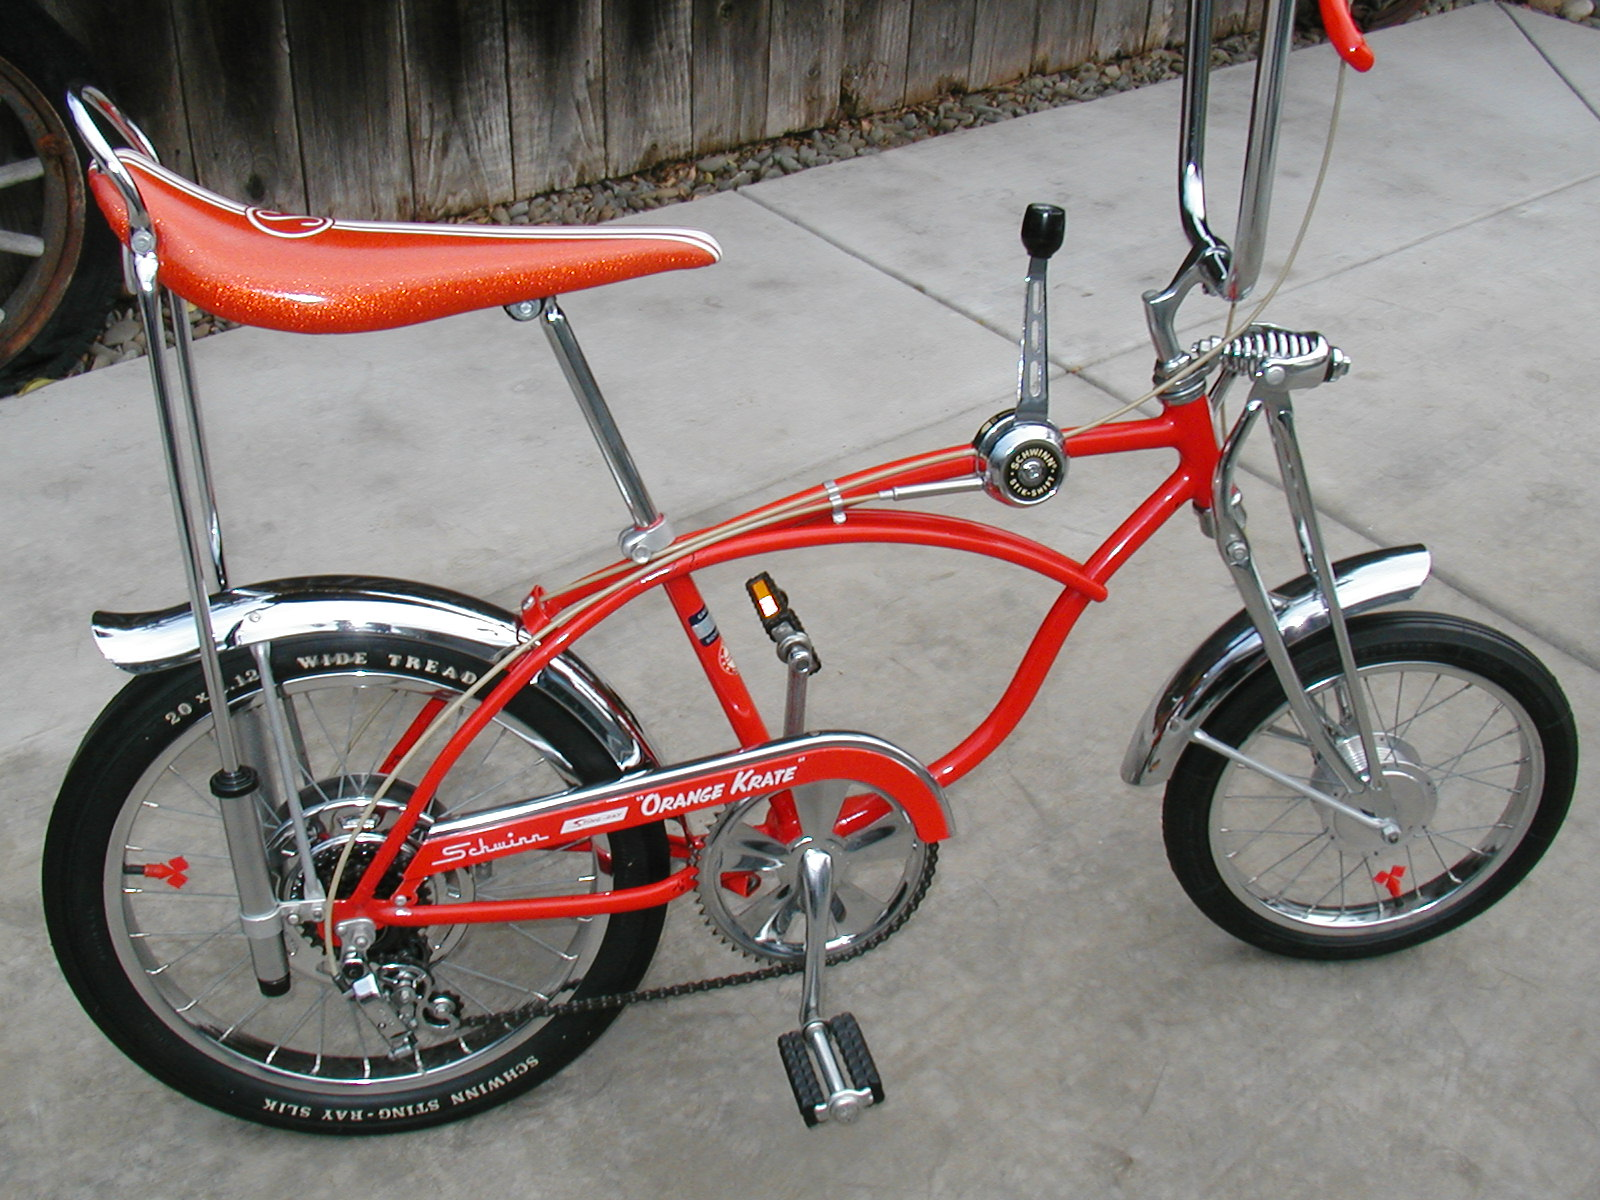 a2e7fc257b6 schwinn stingray orange krate 1973 Sunset Orange Krate | The Classic and  Antique Bicycle Exchange